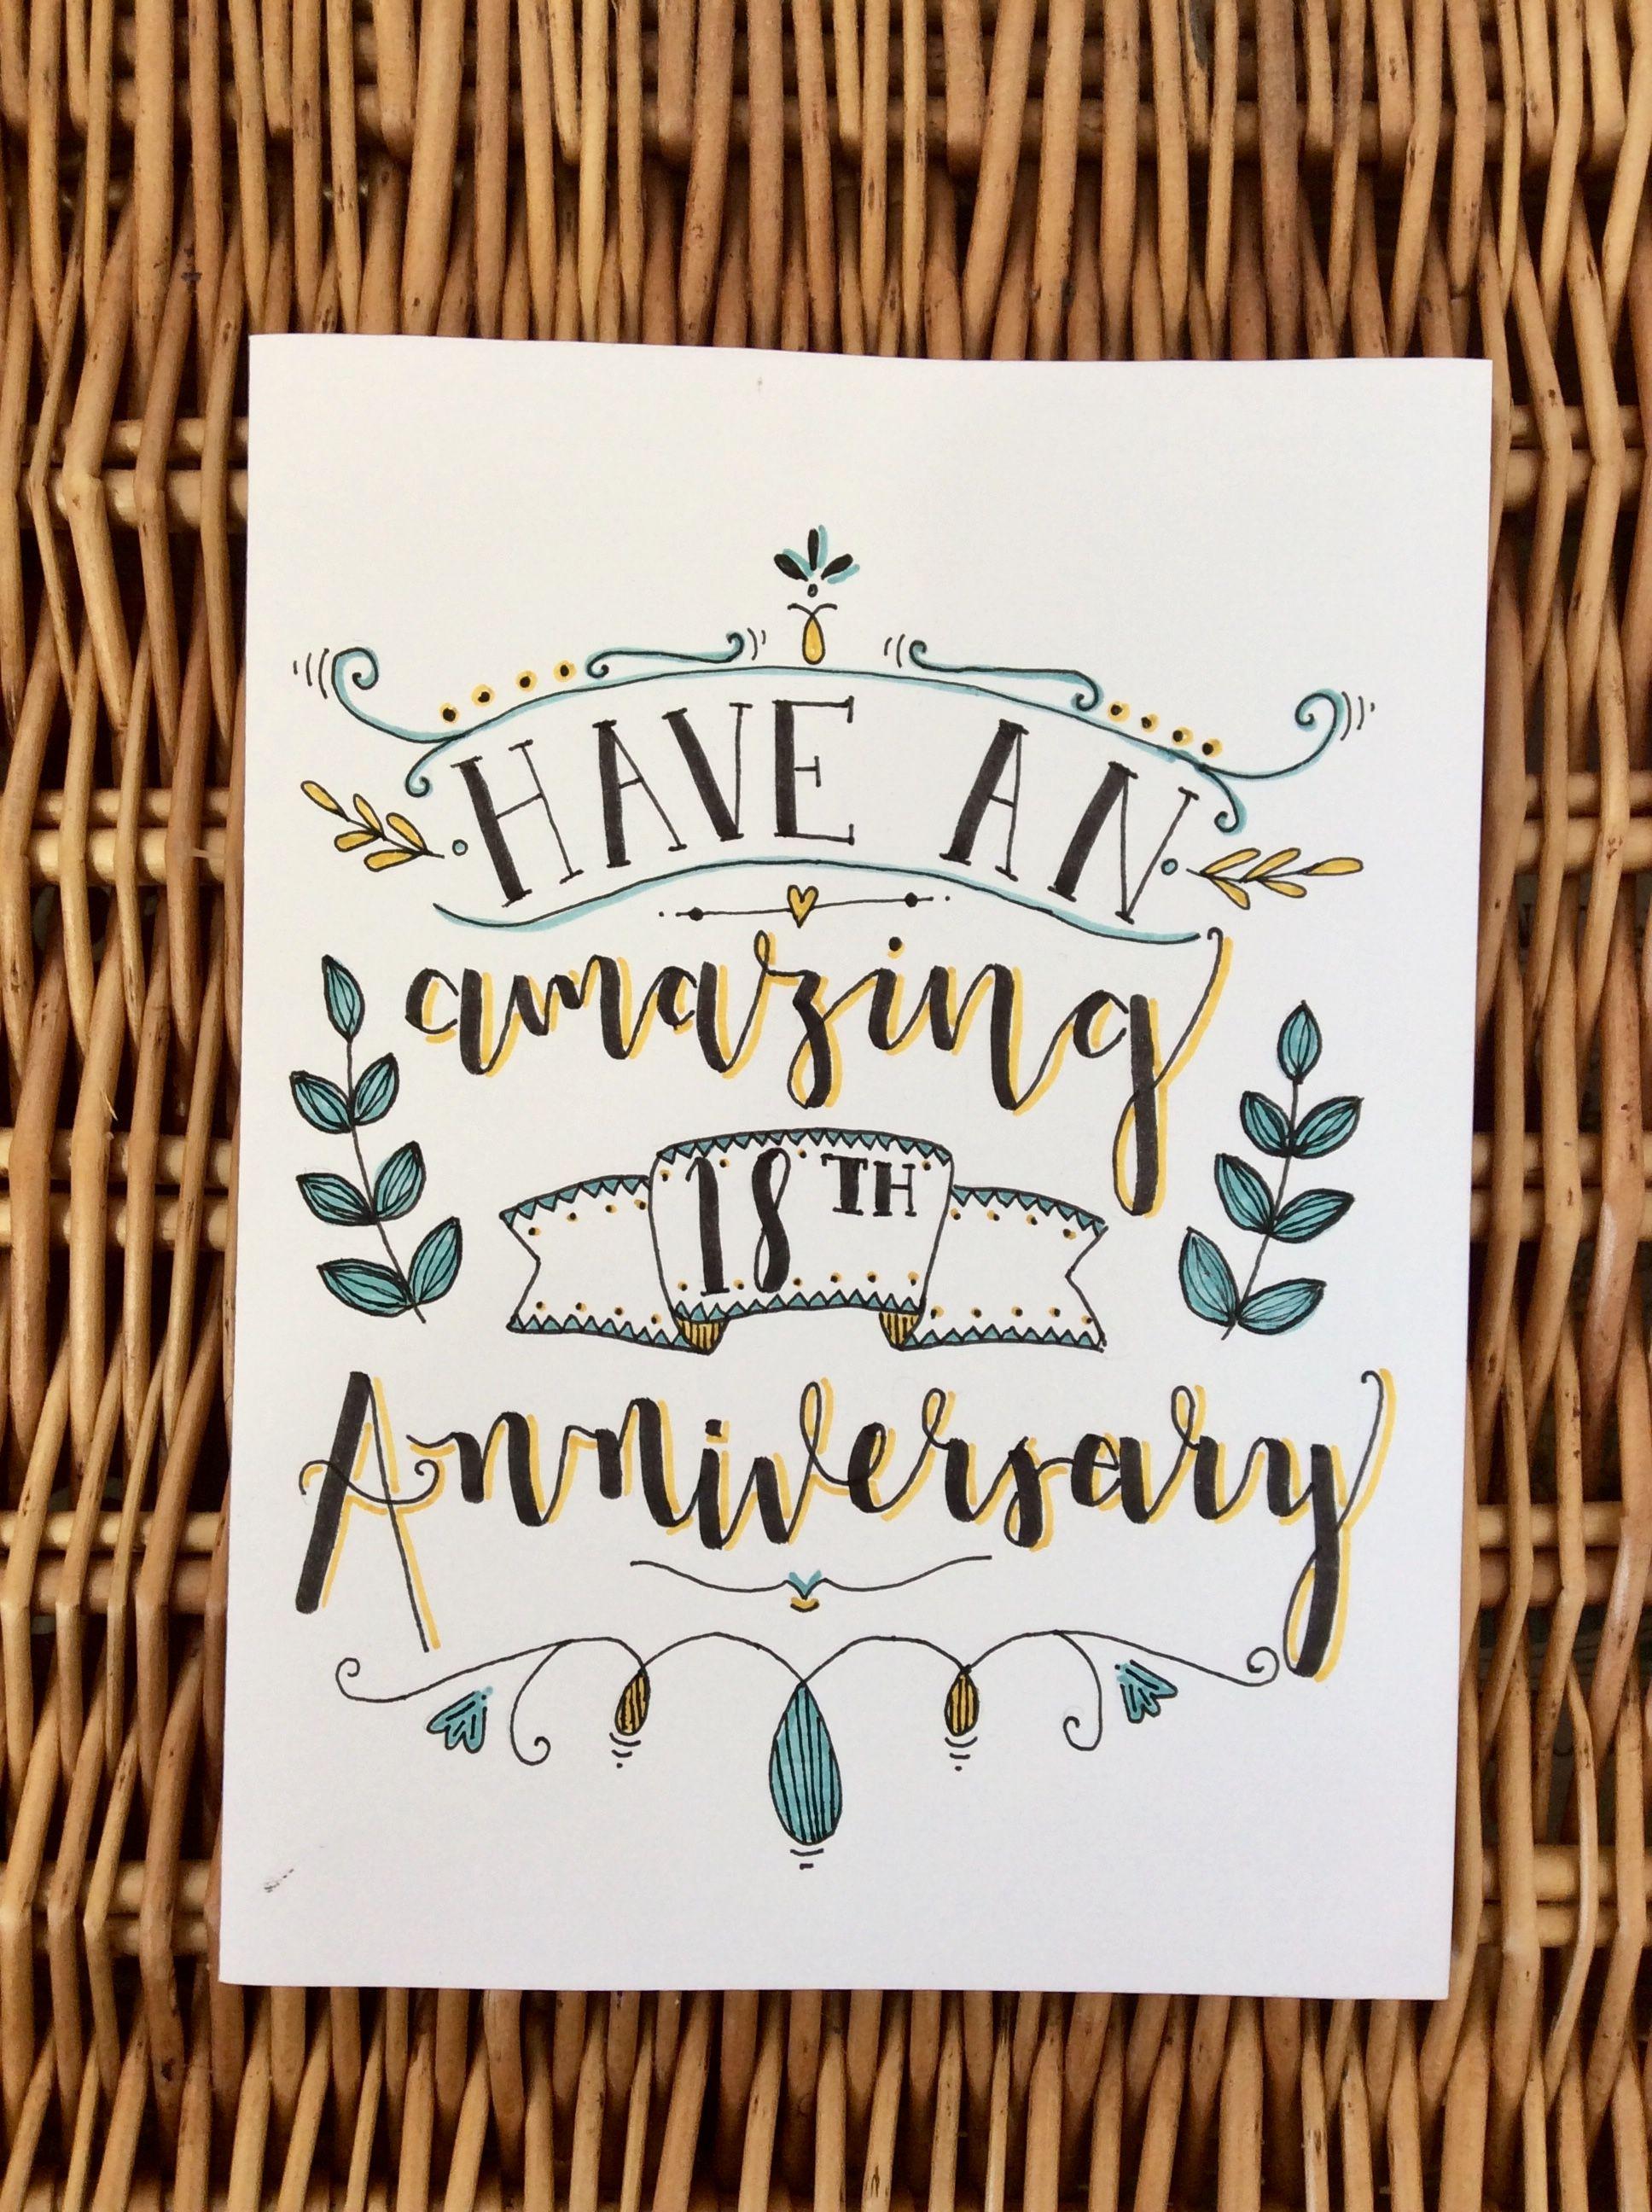 18th anniversary card in 2020 Anniversary cards handmade